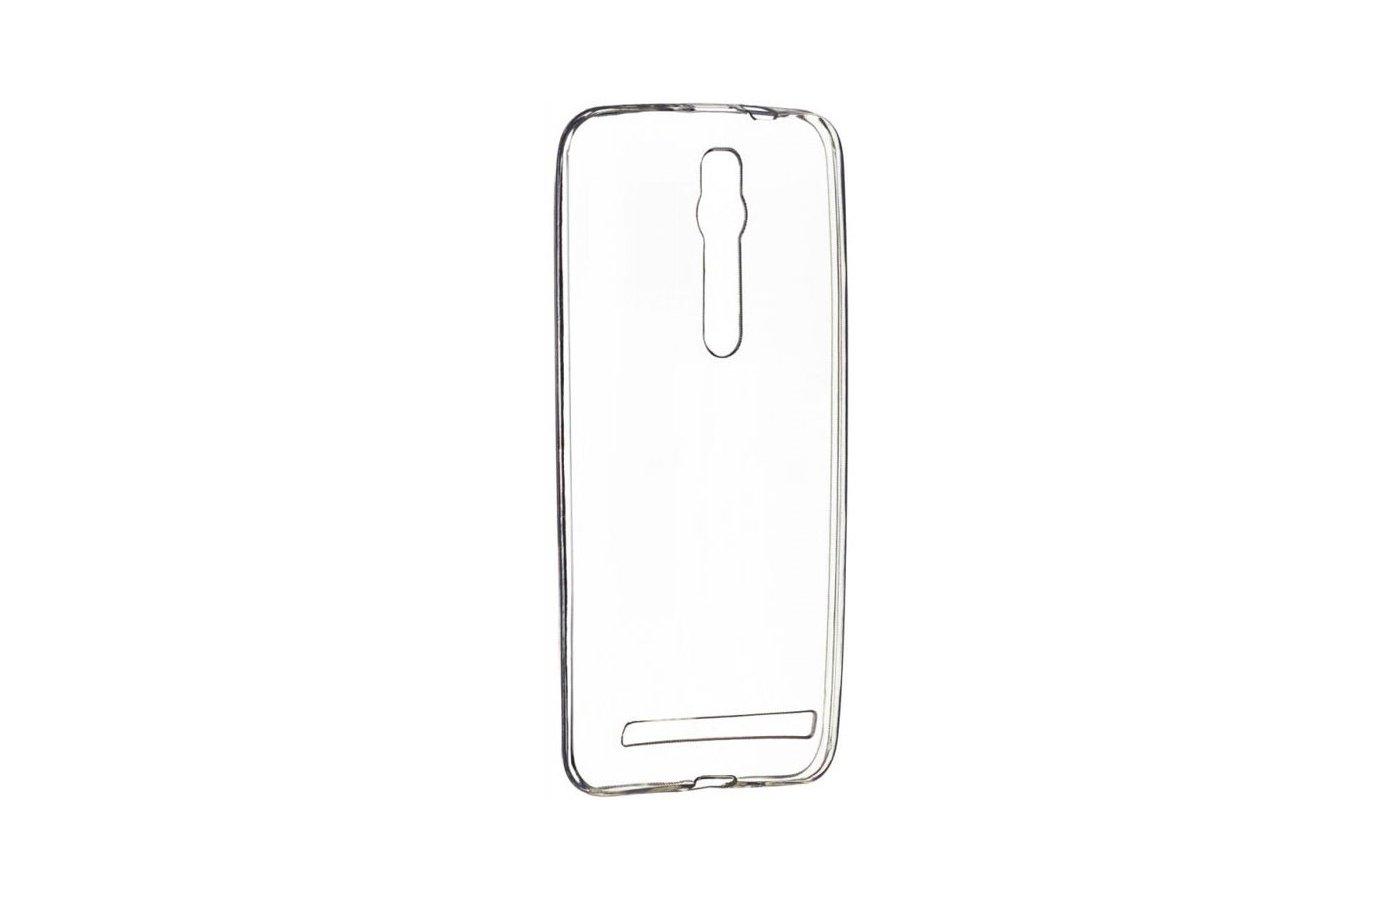 Чехол iBox Crystal для Asus ZenFone 2 (ZE551ML/ZE550ML) прозрачный